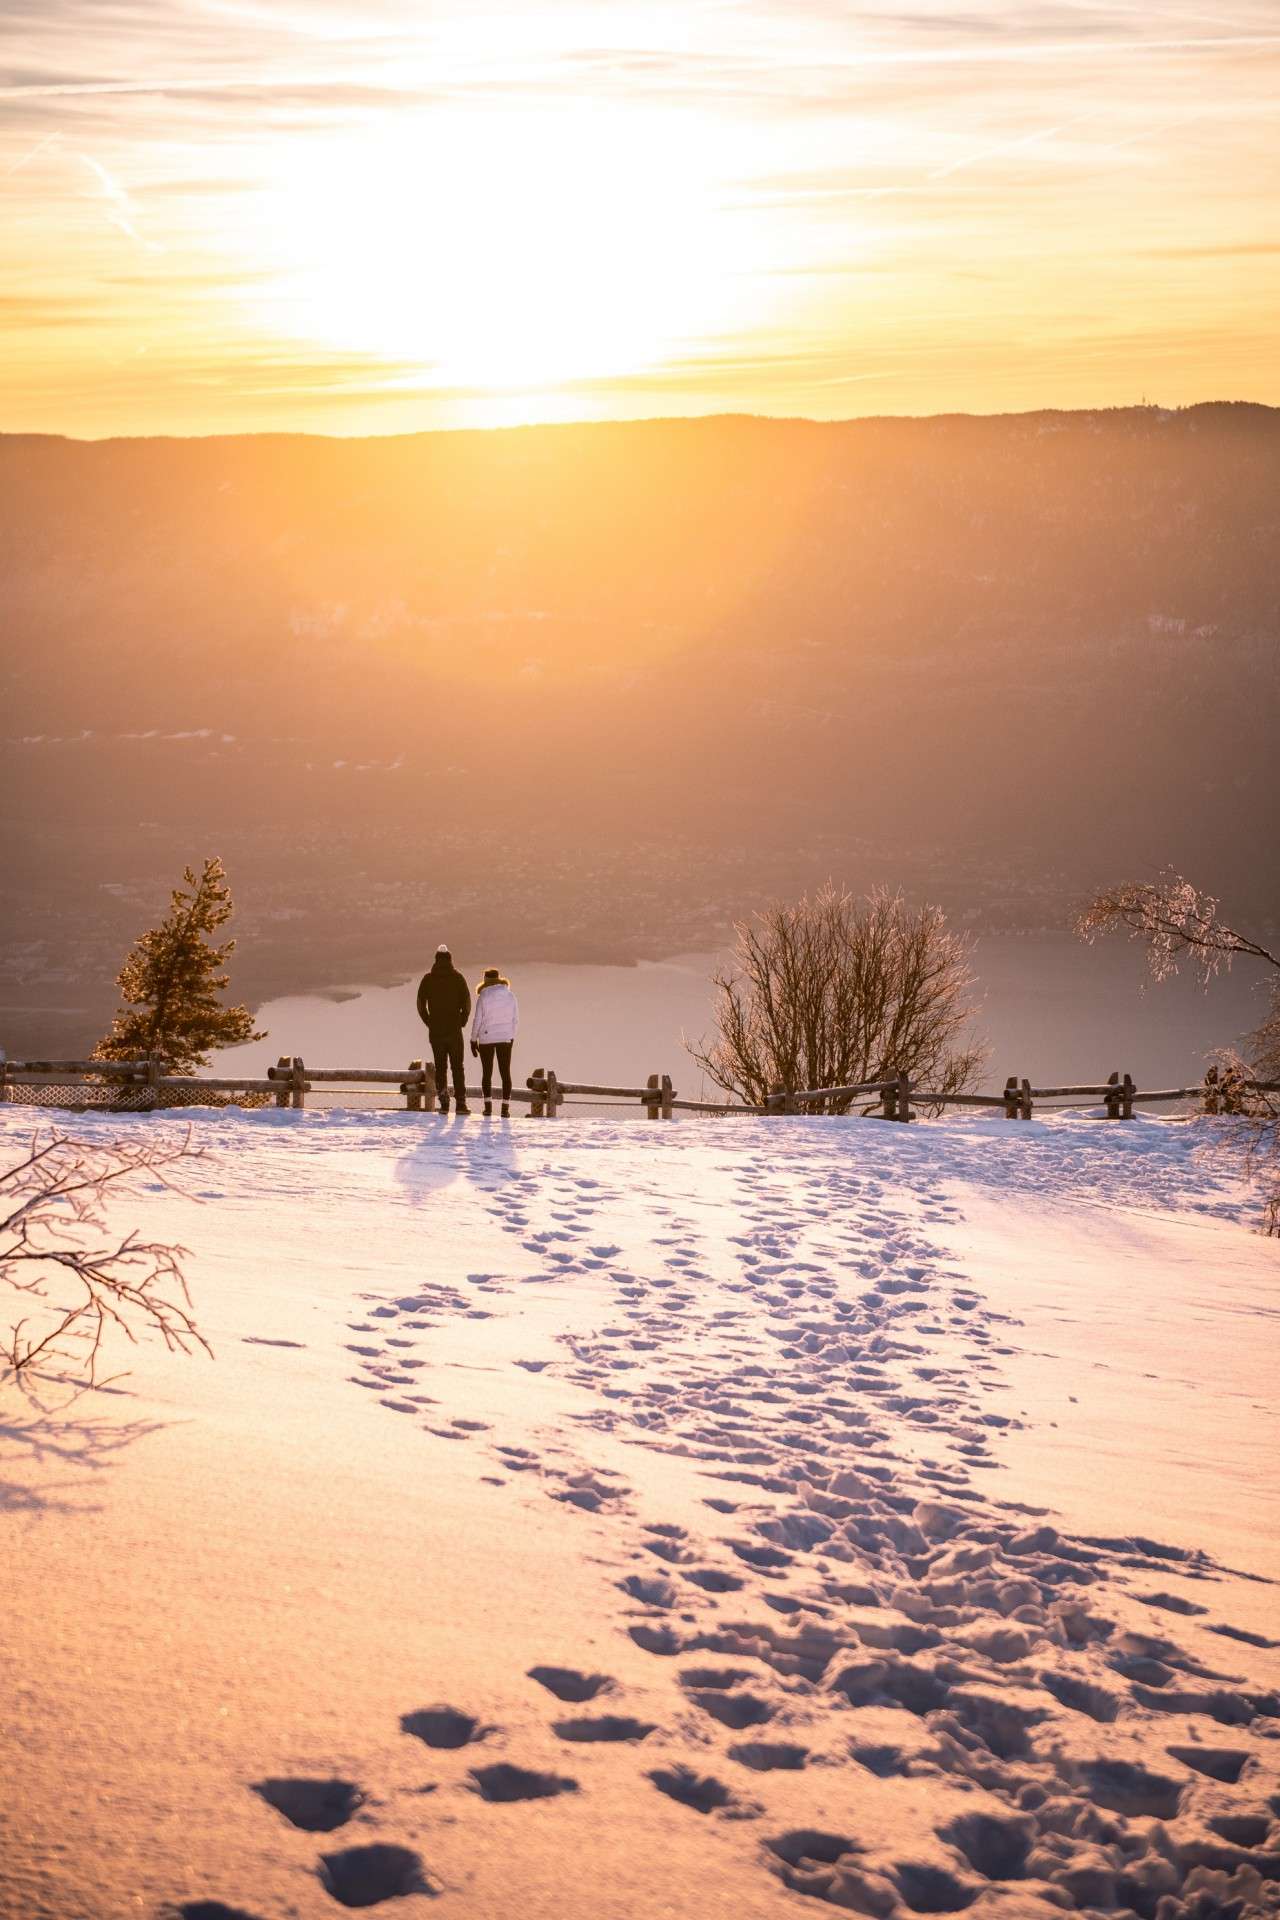 savoie-grand-revard-hiver-2019-peignee-verticale-439